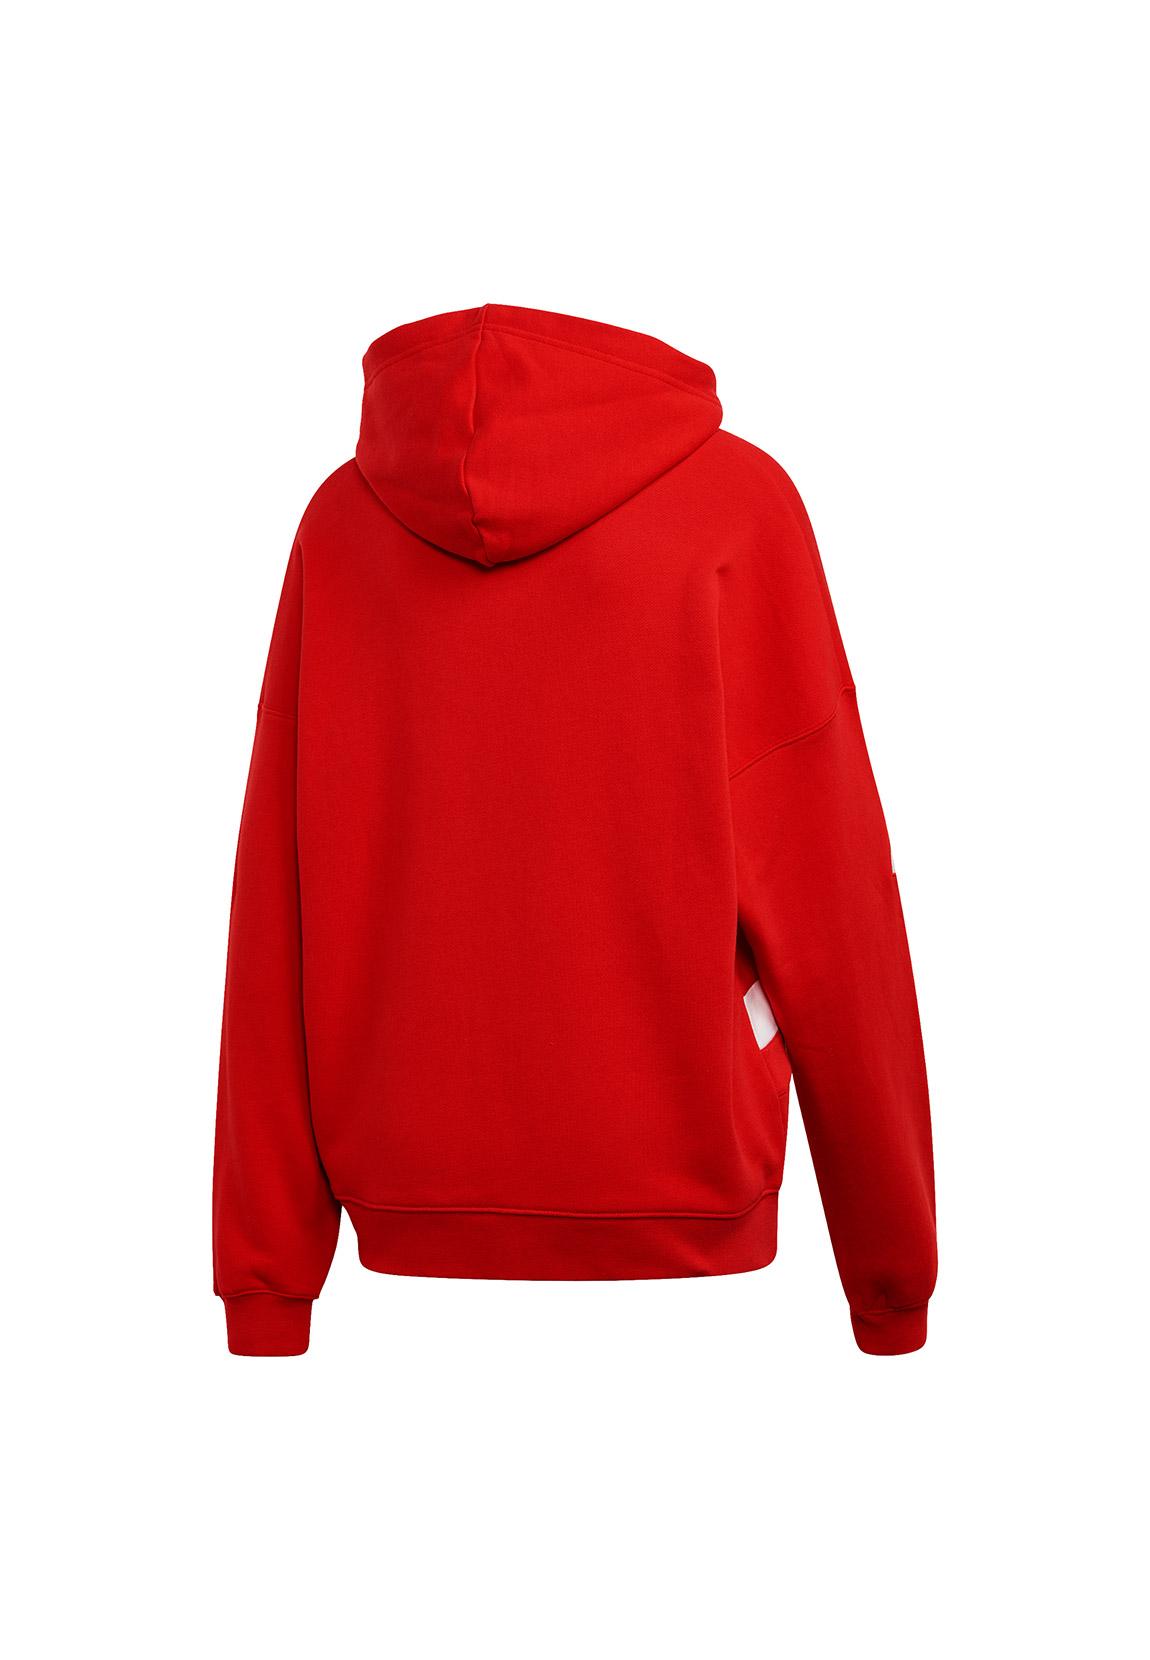 Adidas Originals Kapuzenpullover Damen LRG LOGO Hoodie FS1307 Rot